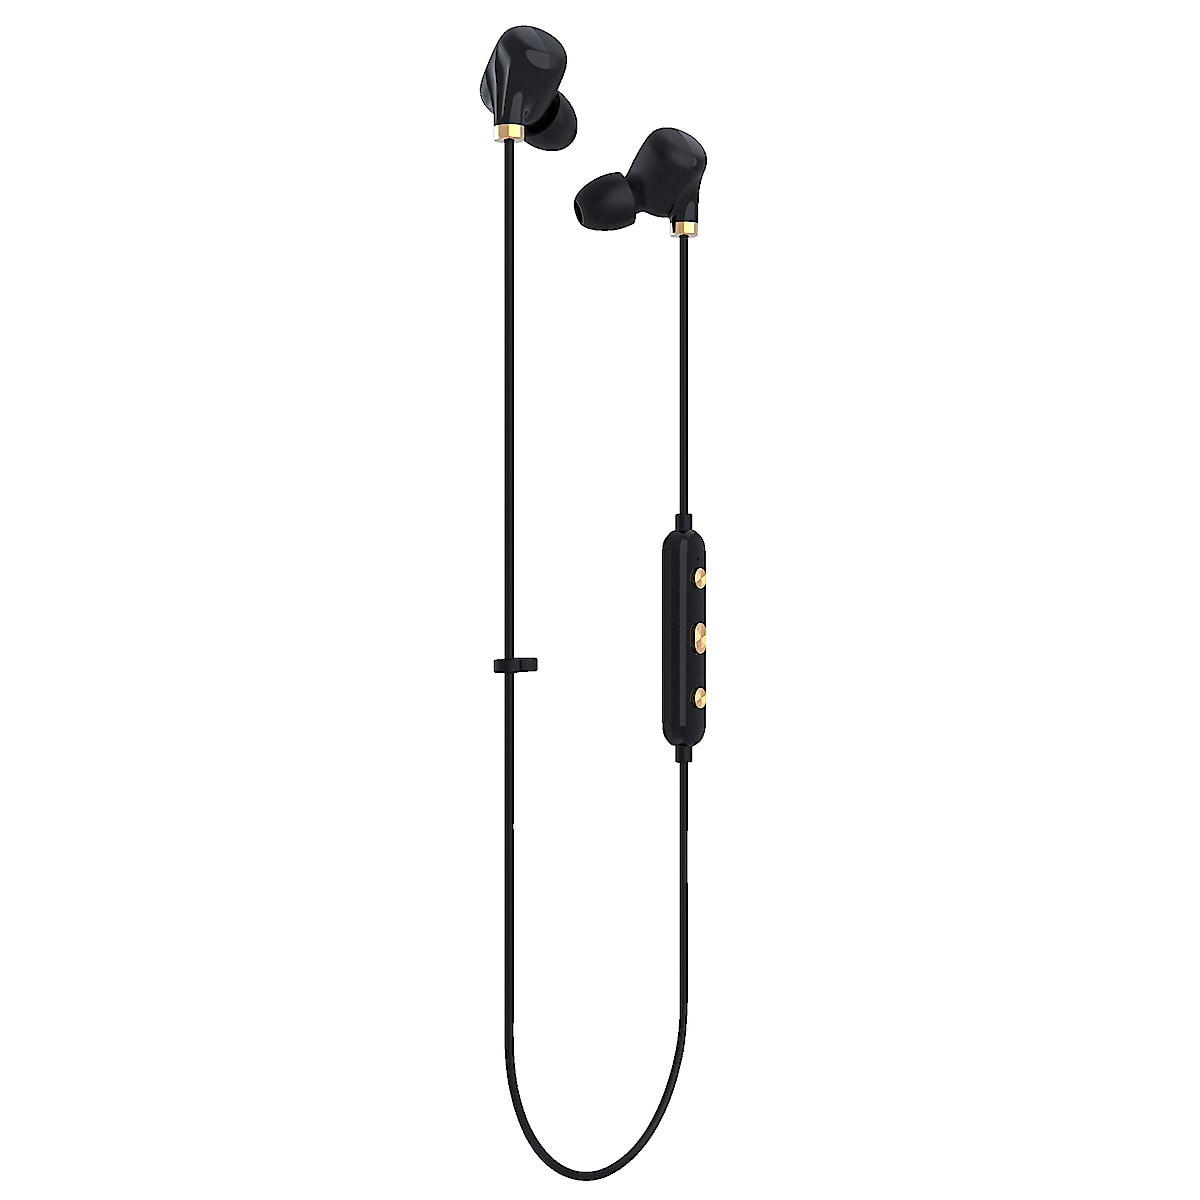 Trådlösa hörlurar med mikrofon Happy Plugs Wireless Ear Piece II